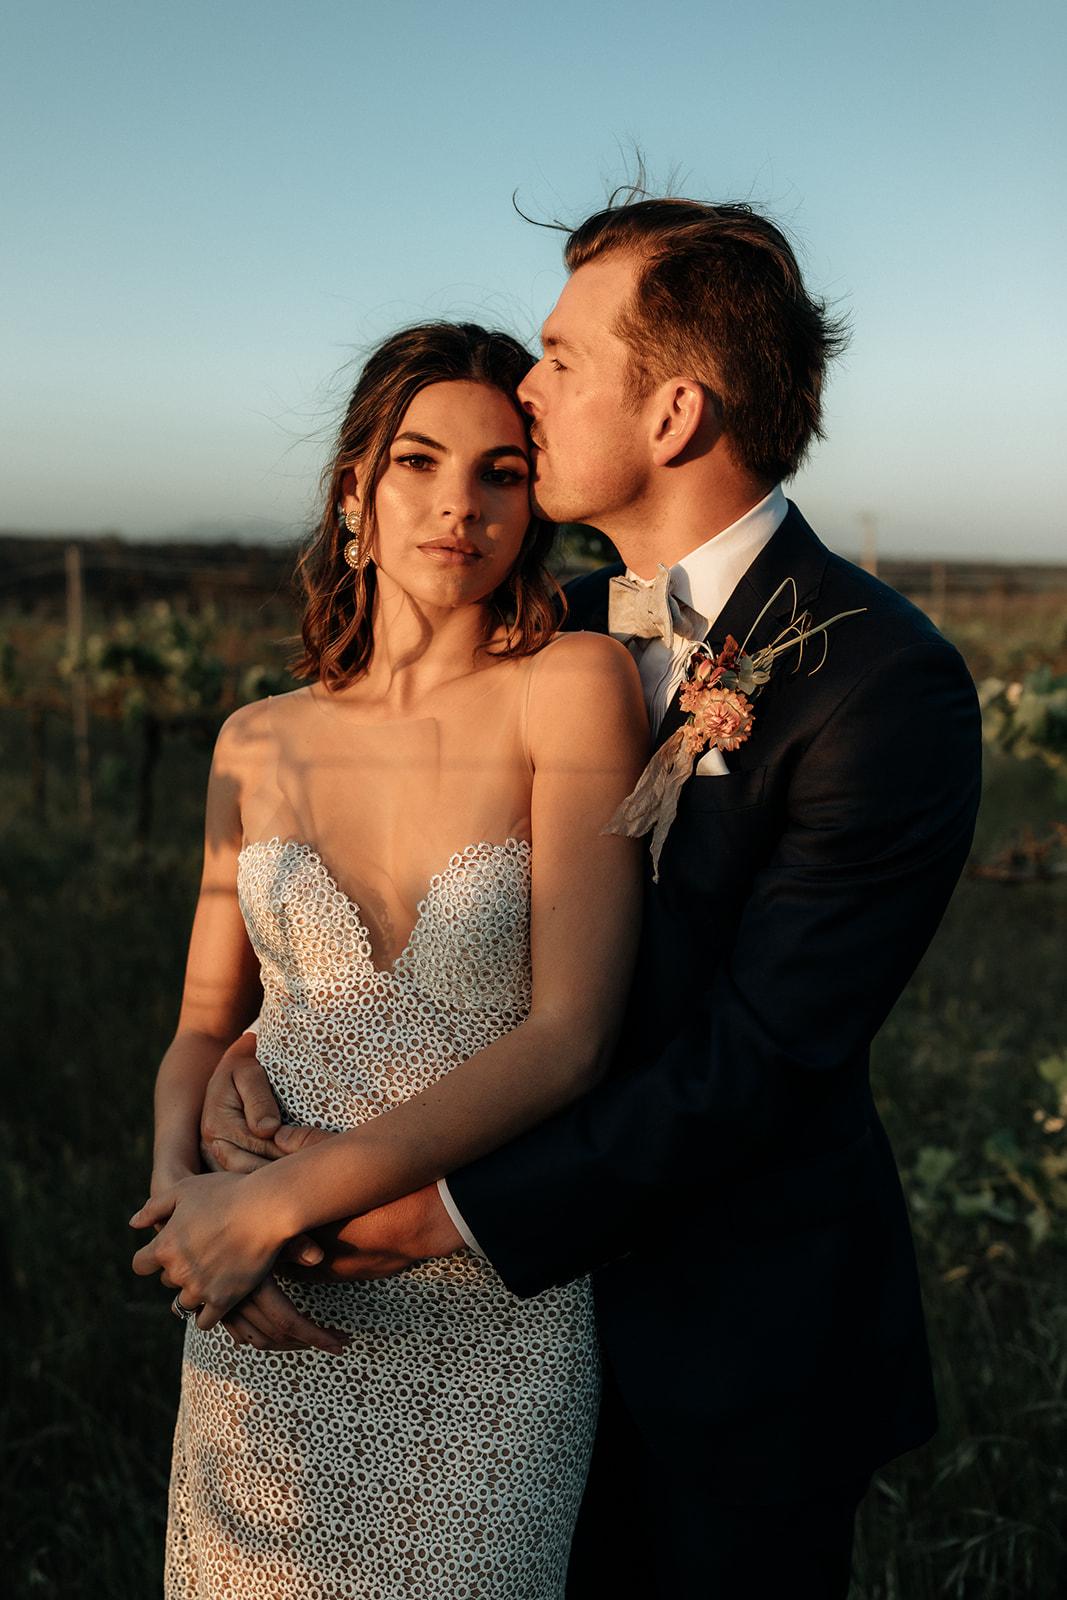 JACKSON + RUTH'S MICRO WEDDING INSPIRATION